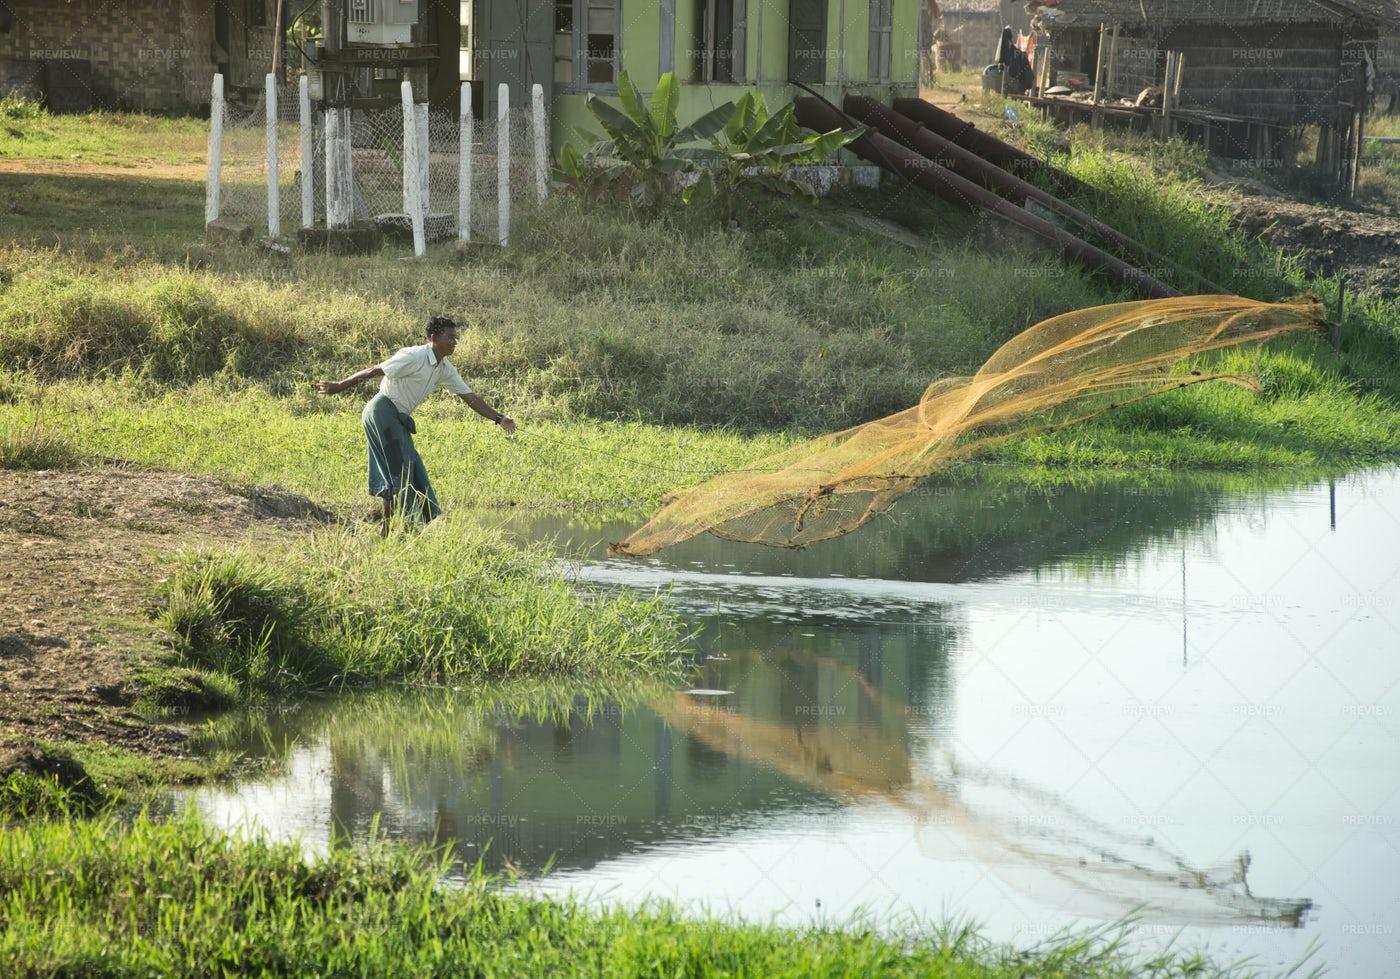 Fisherman Throwing A Fishing Net: Stock Photos